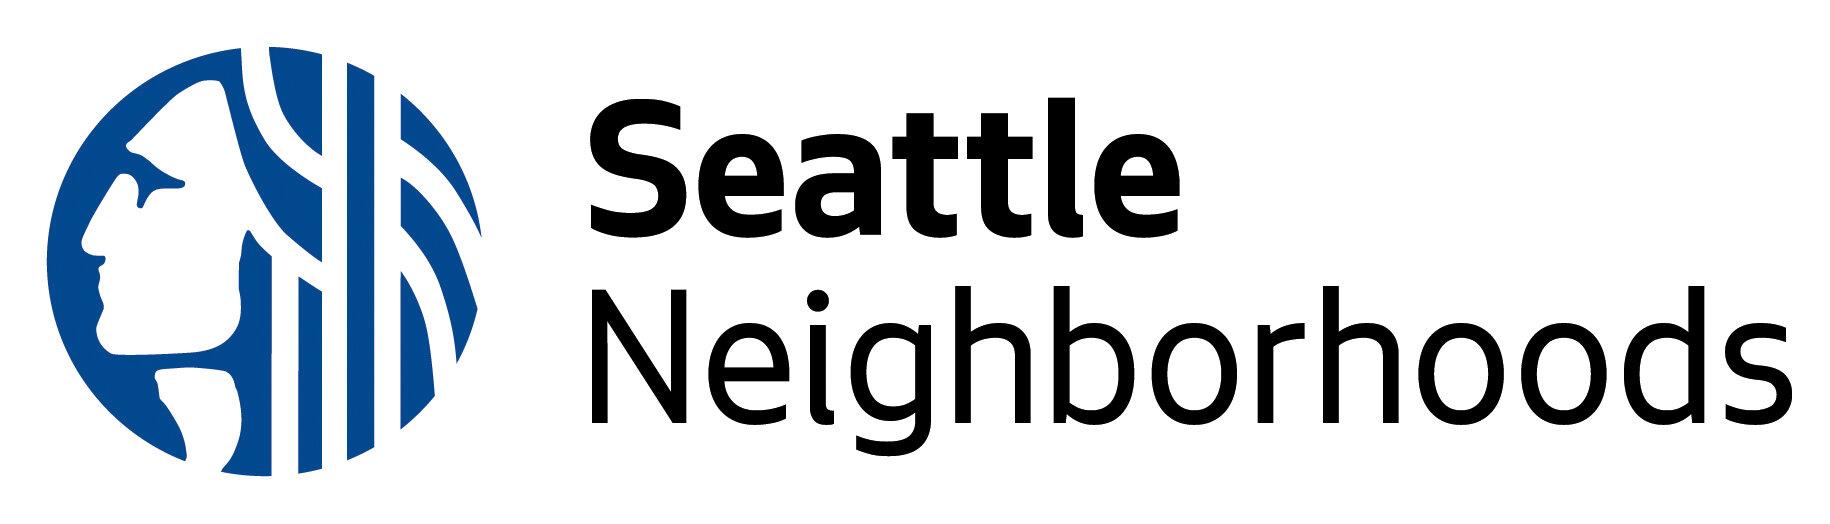 Image description: Seattle Neighborhoods logo